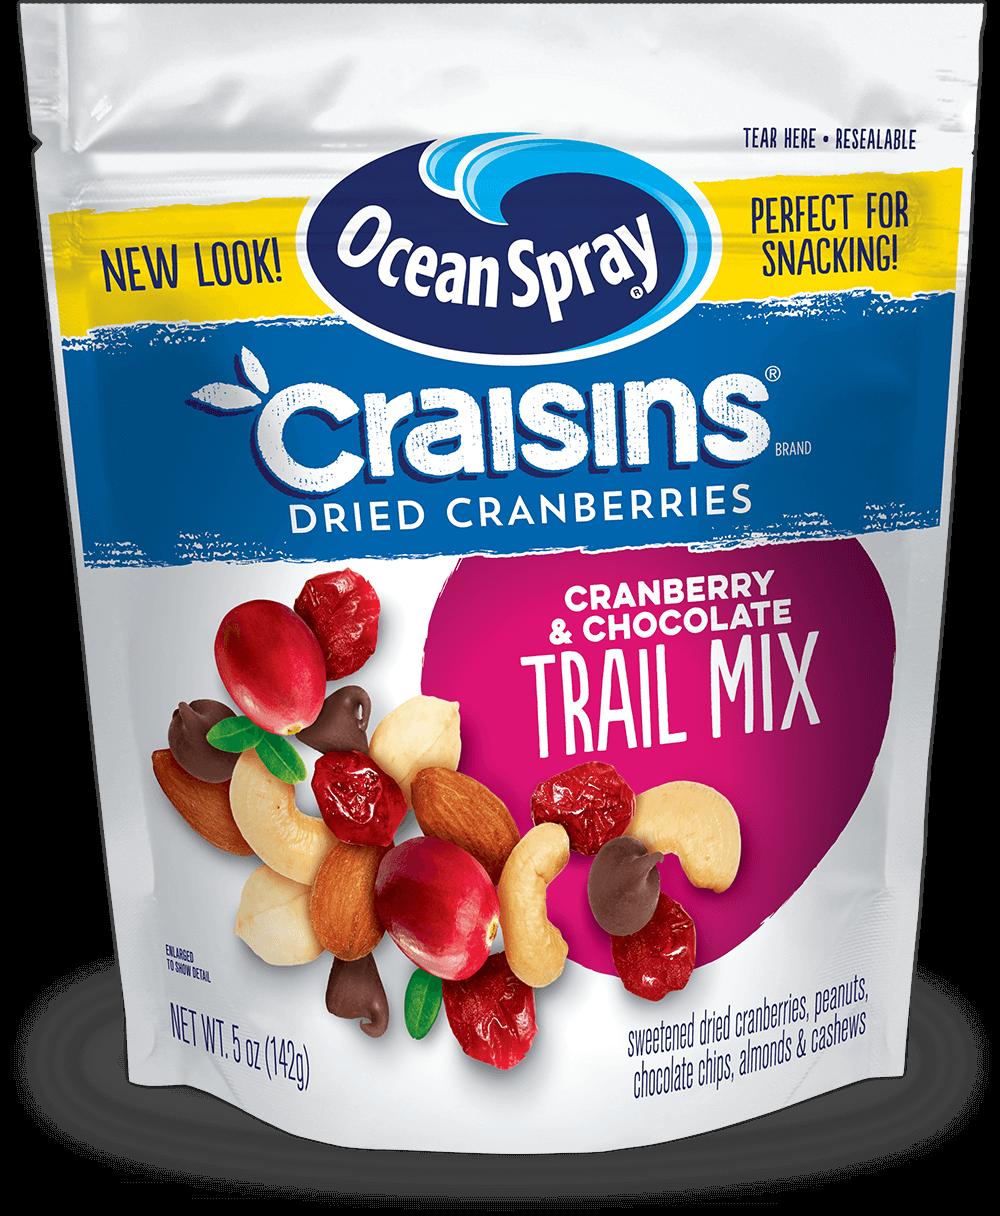 Craisins® Dried Cranberries Trail Mix Cranberries & Chocolate